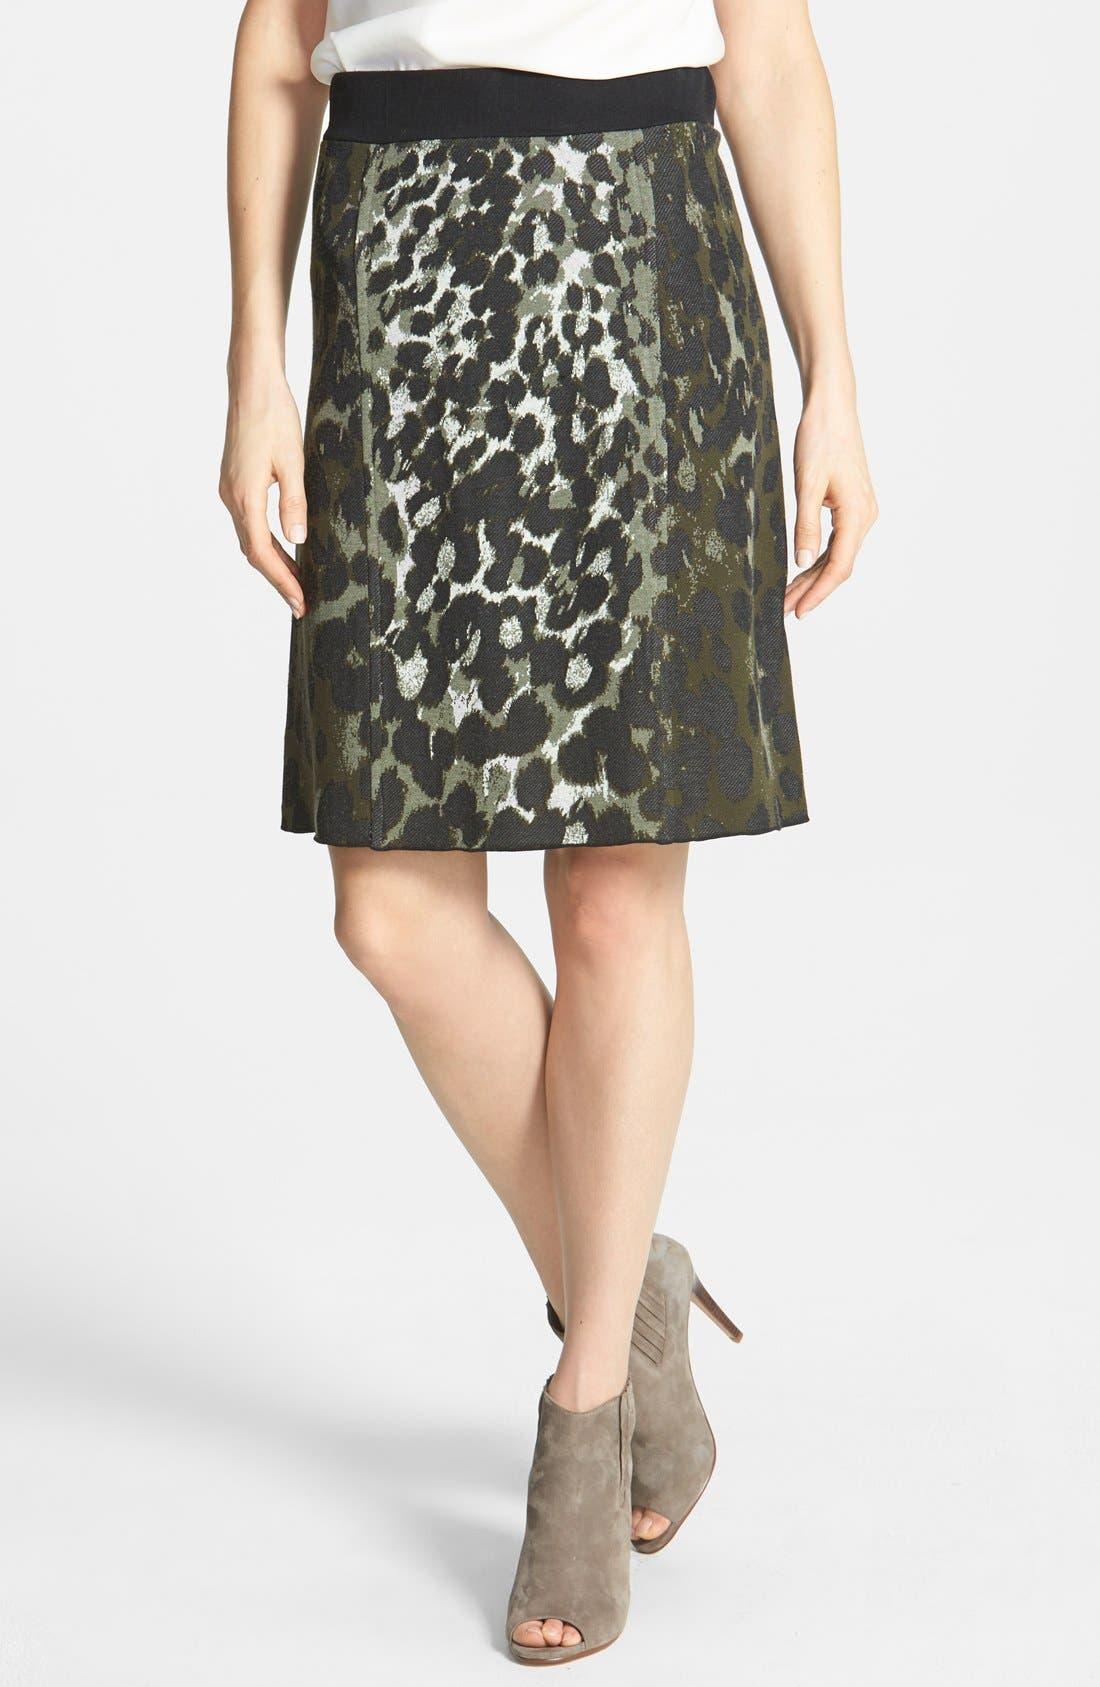 Alternate Image 1 Selected - NIC+ZOE Print Knit Skirt